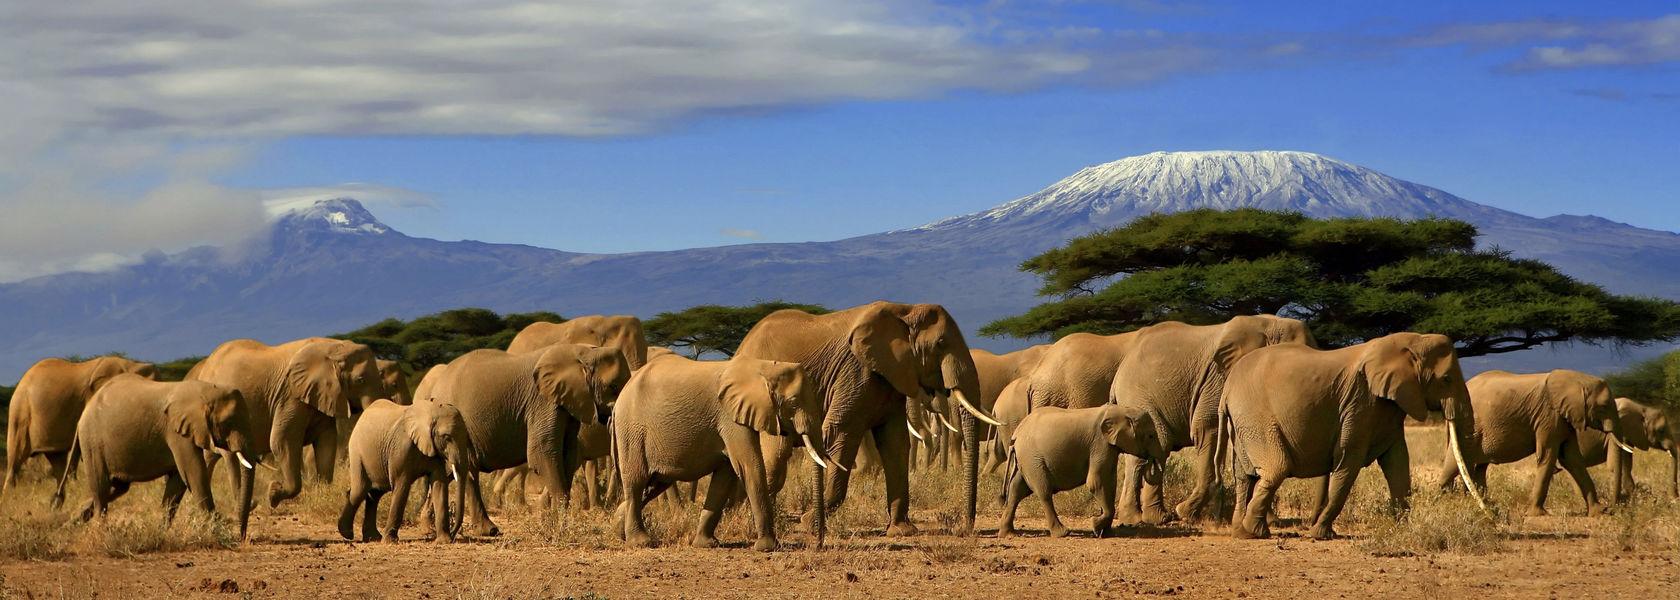 Rondreis Tanzania – Uit liefde voor Tanzania | Matoke Tours